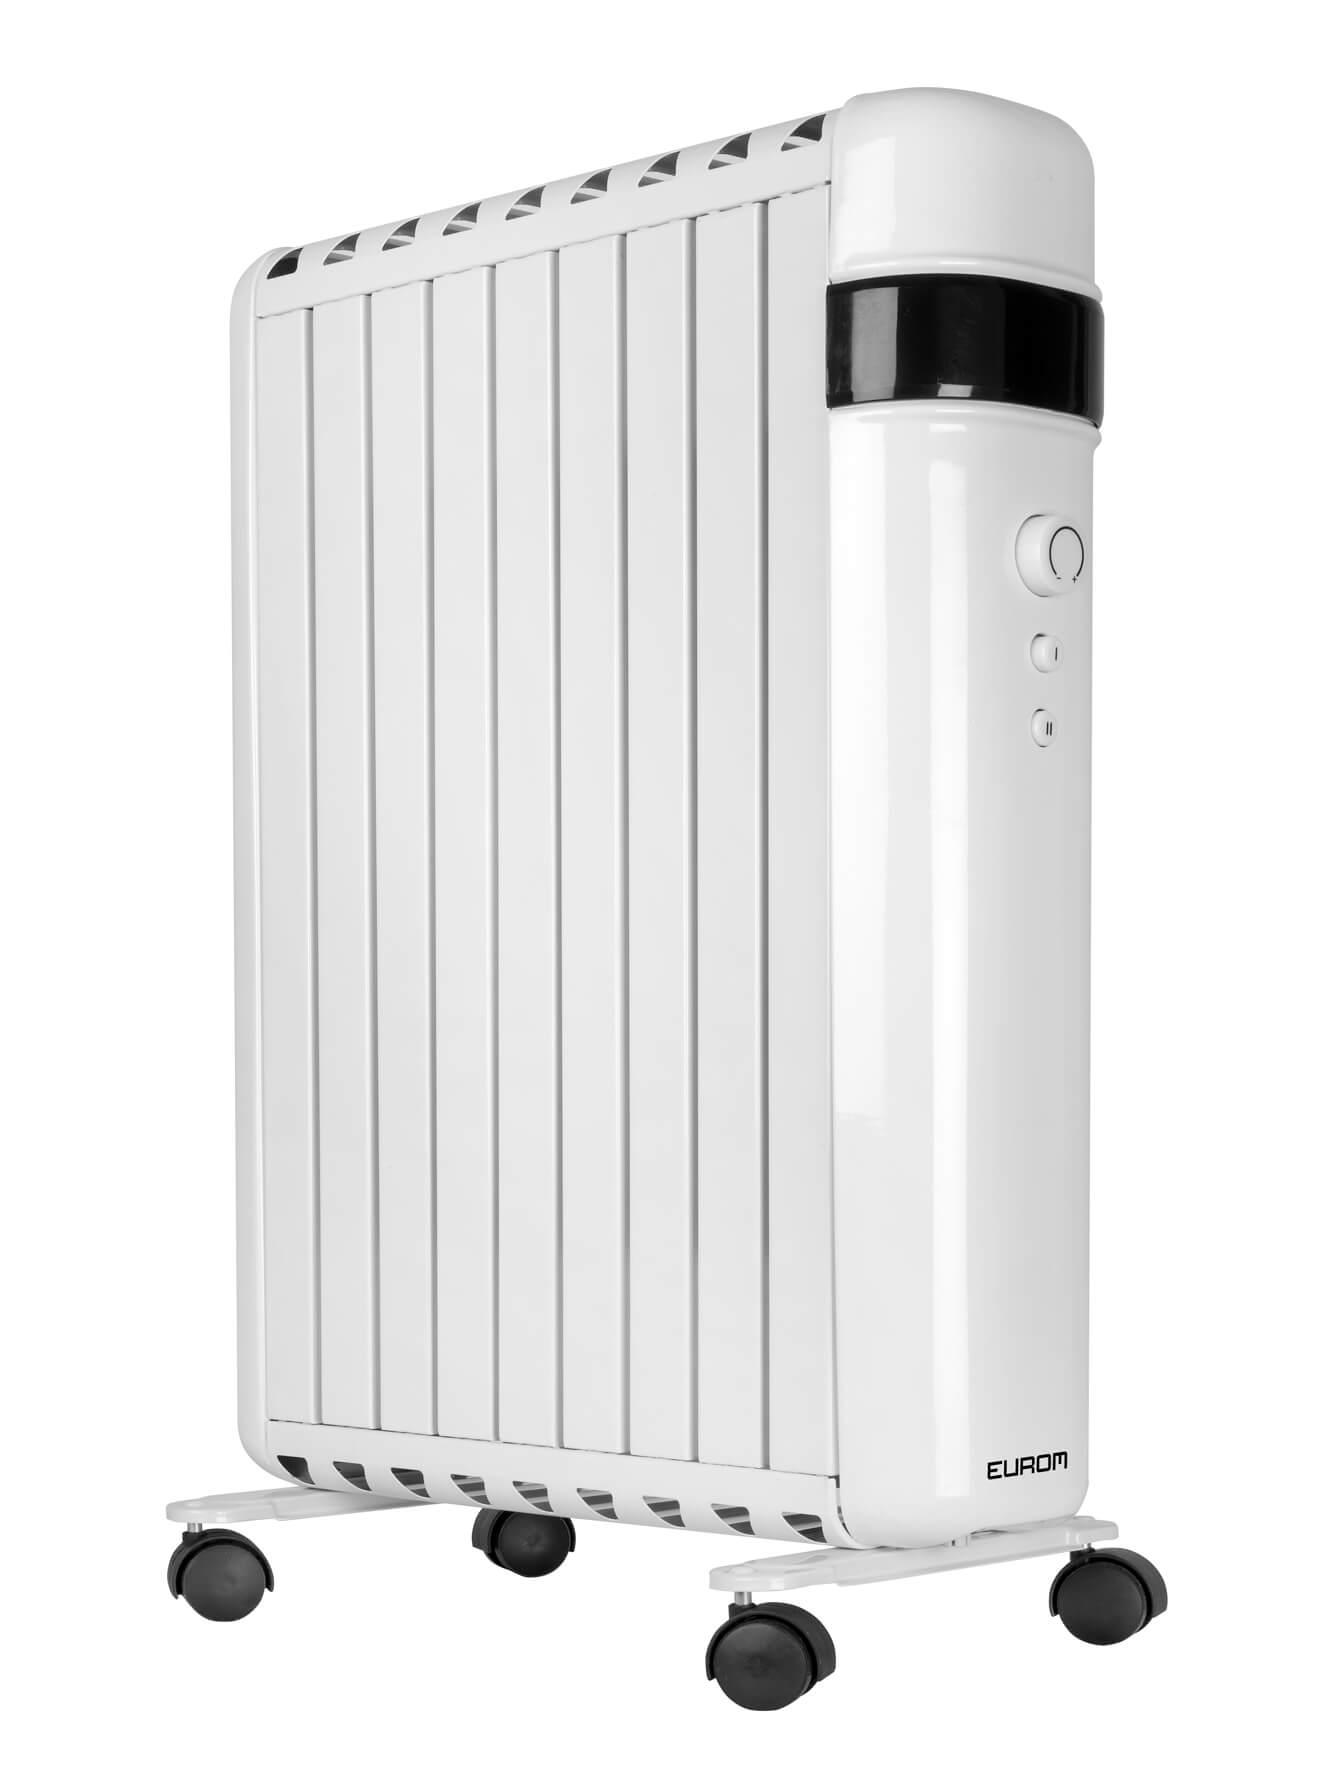 Eurom RAD2000 Oil Free elektrische verwarming 2000W   Olievrije radiatorkachel (radiatorkachel)